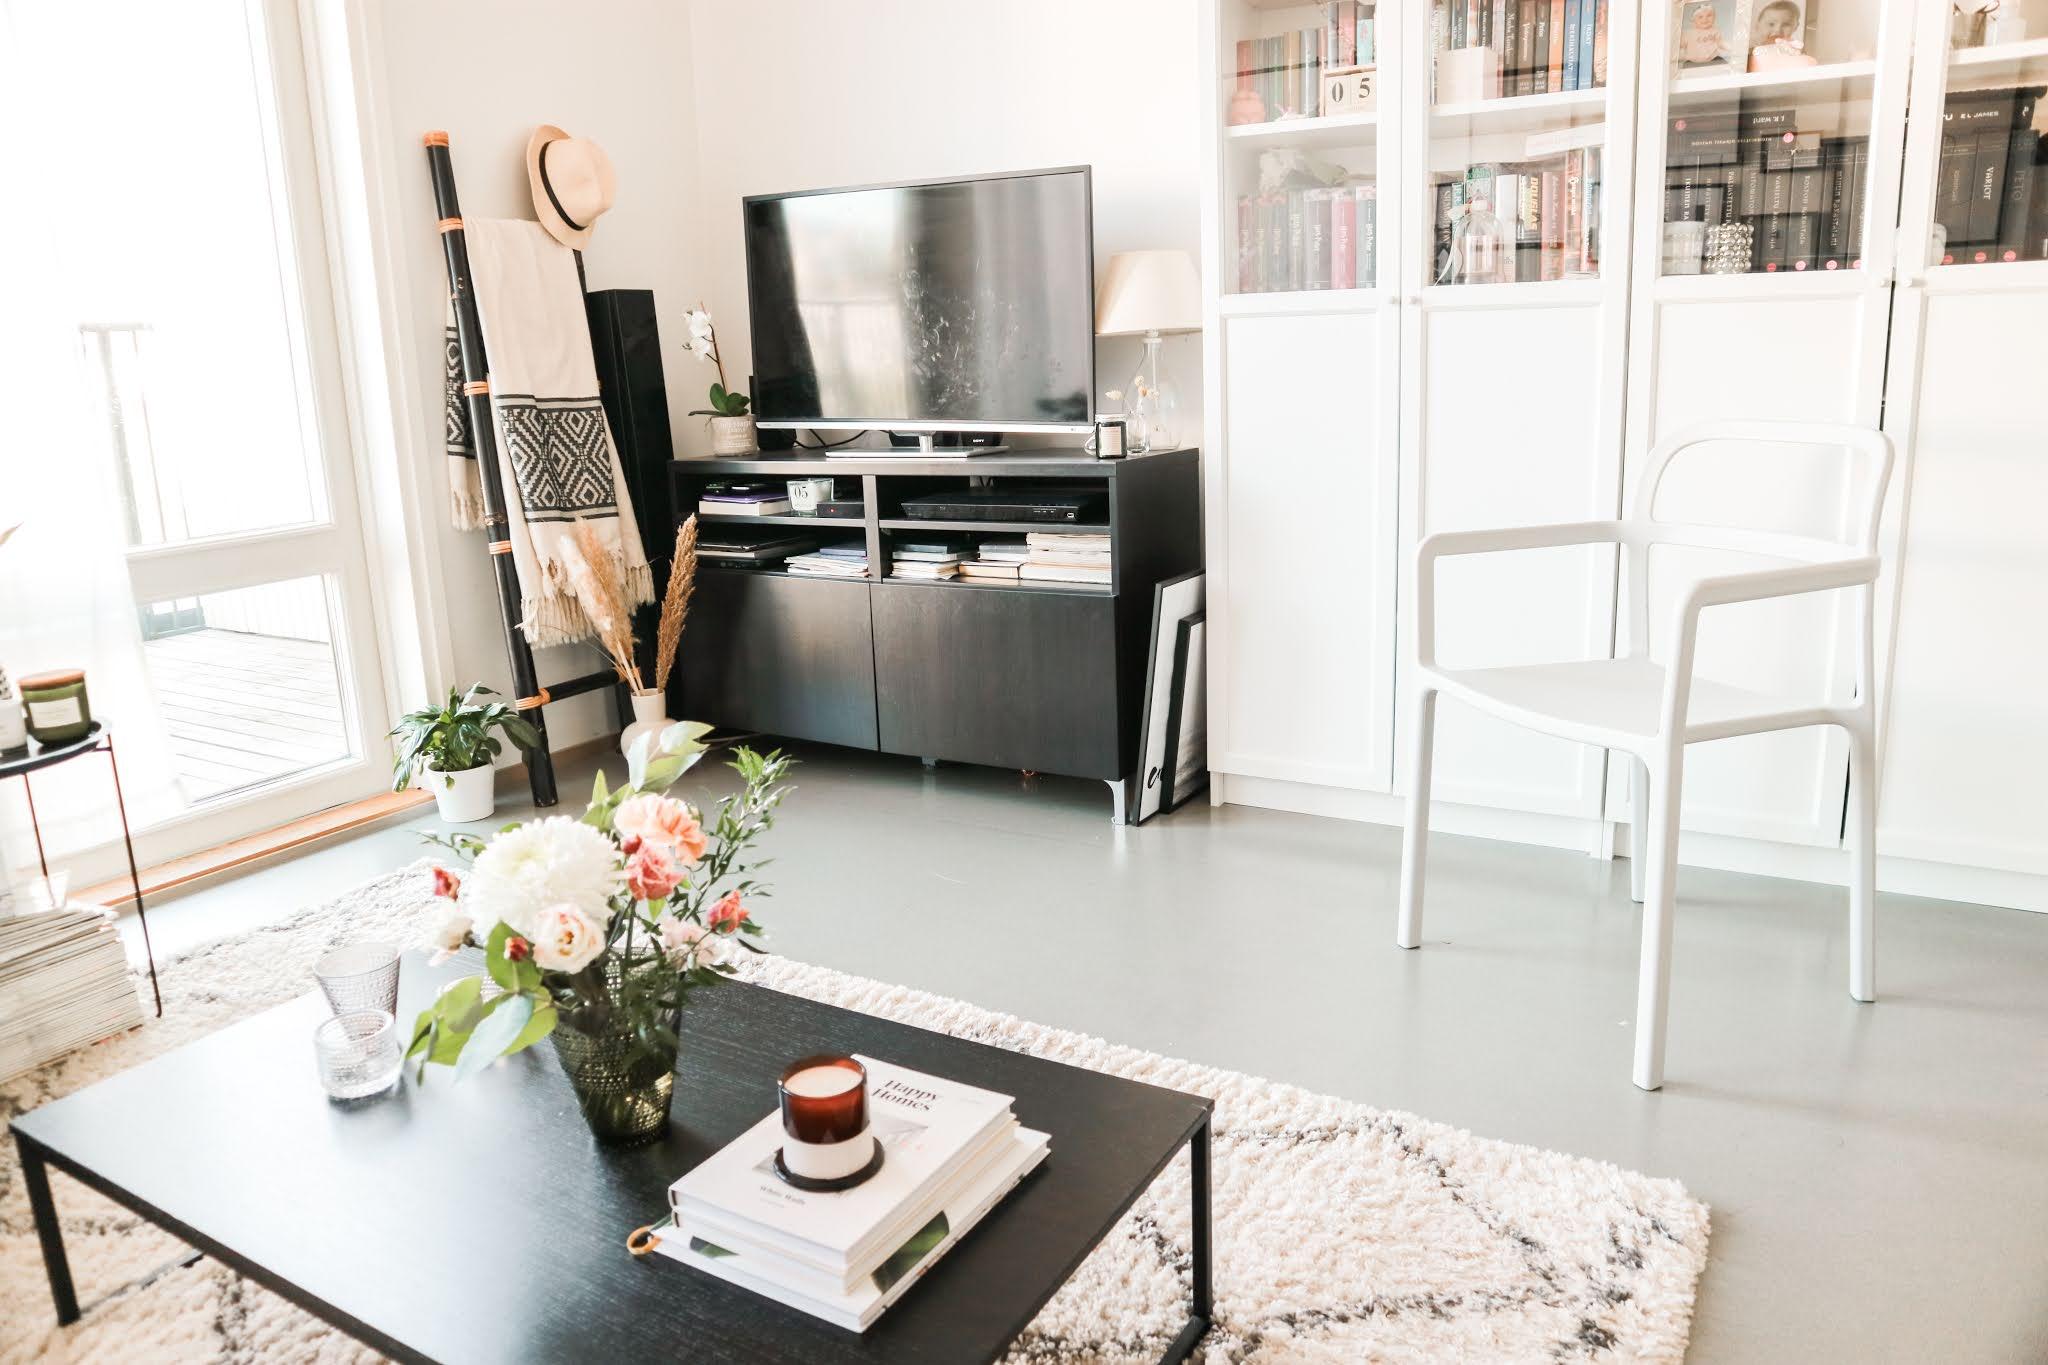 Big mamas home by Jenni S. Ruokapöydän uudet tuolit: Ikea Ypperlig